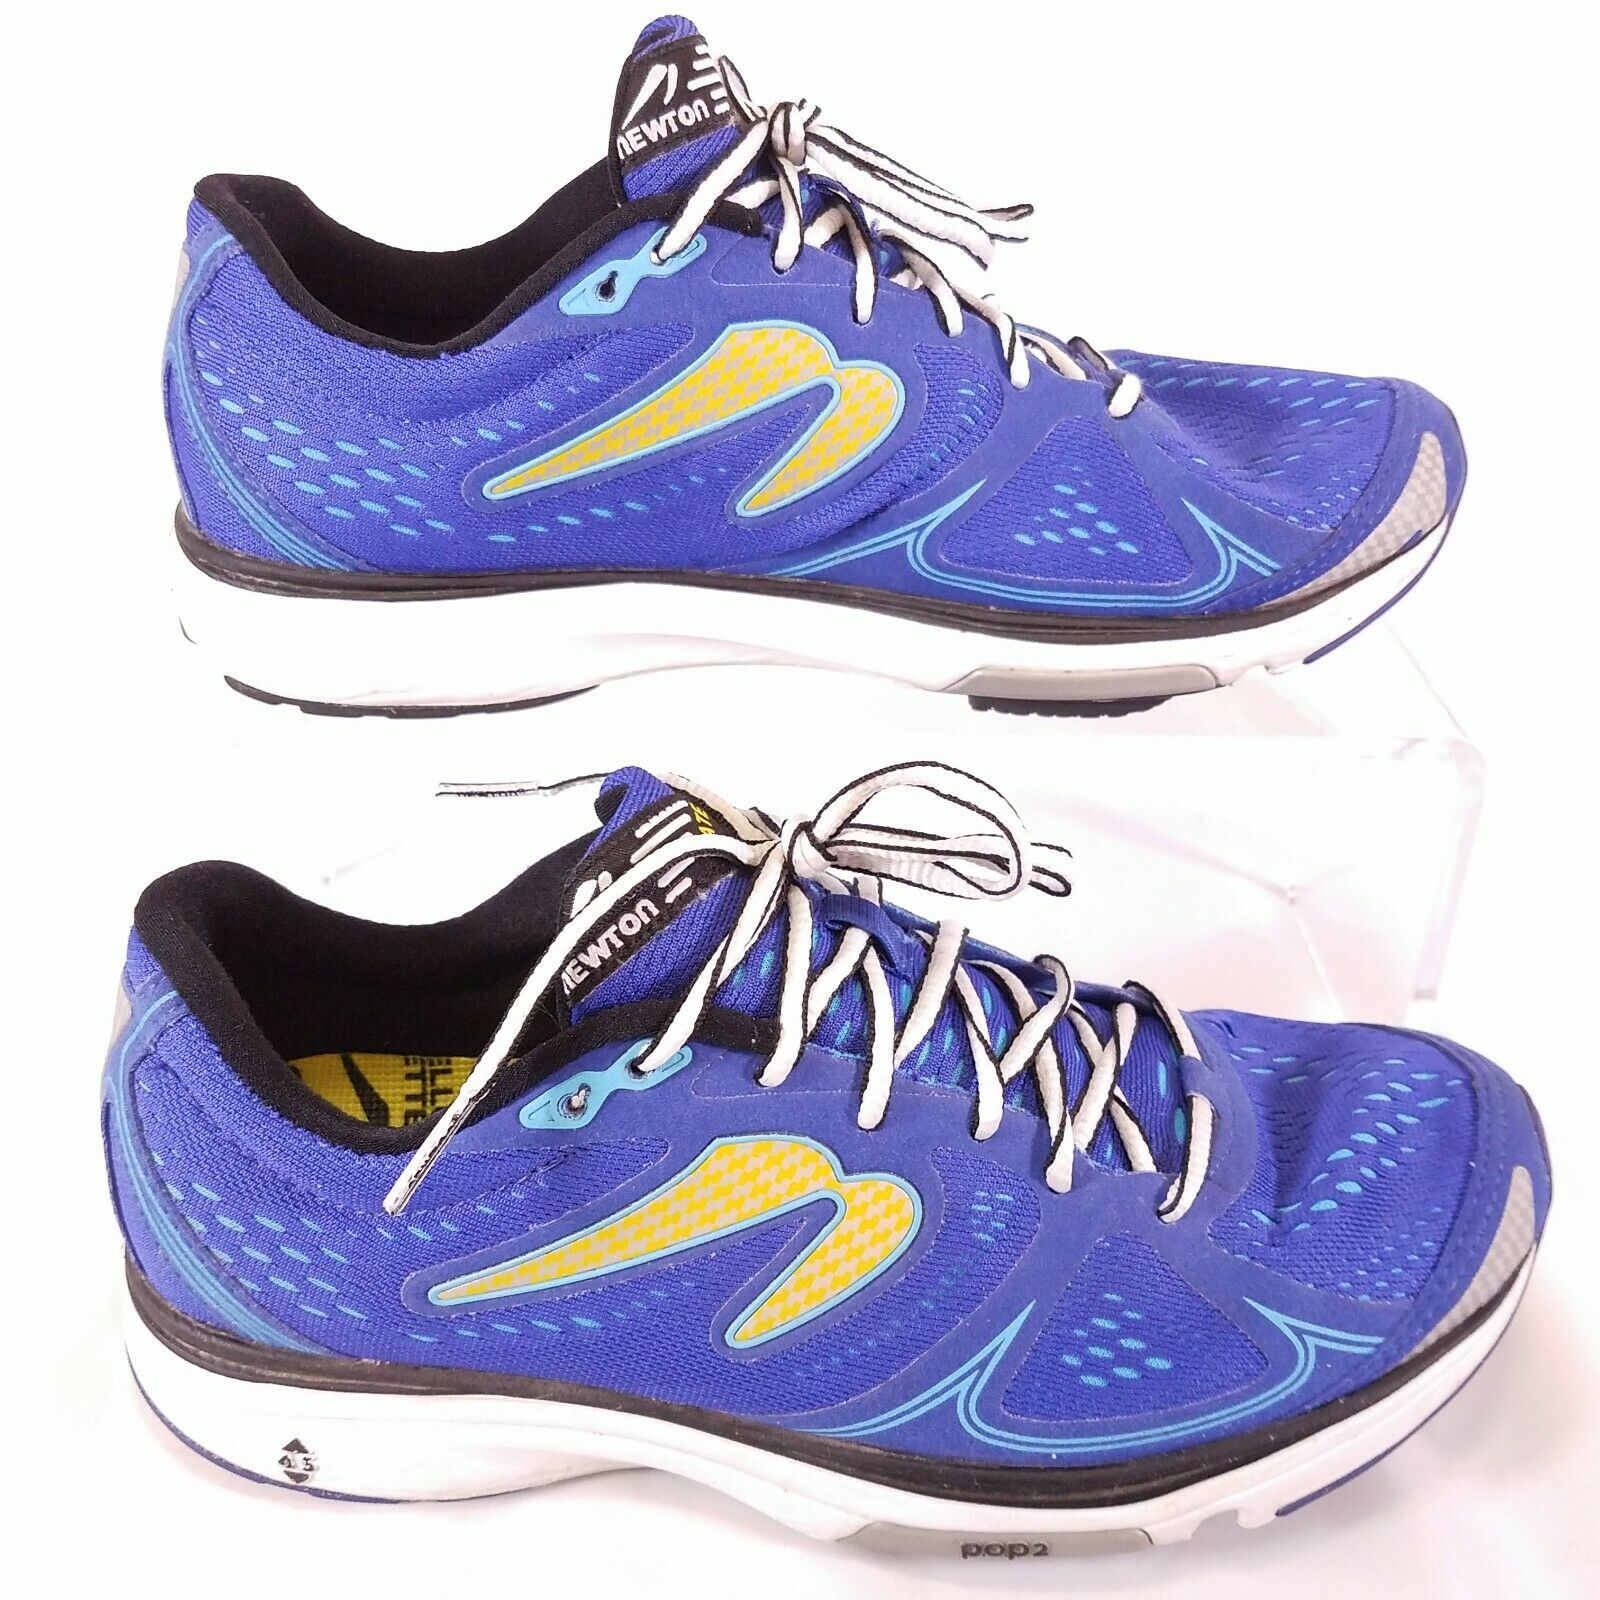 Newton FATE M011514B Mens 8.5 bluee Yellow REFLECTIVE Running shoes light q6